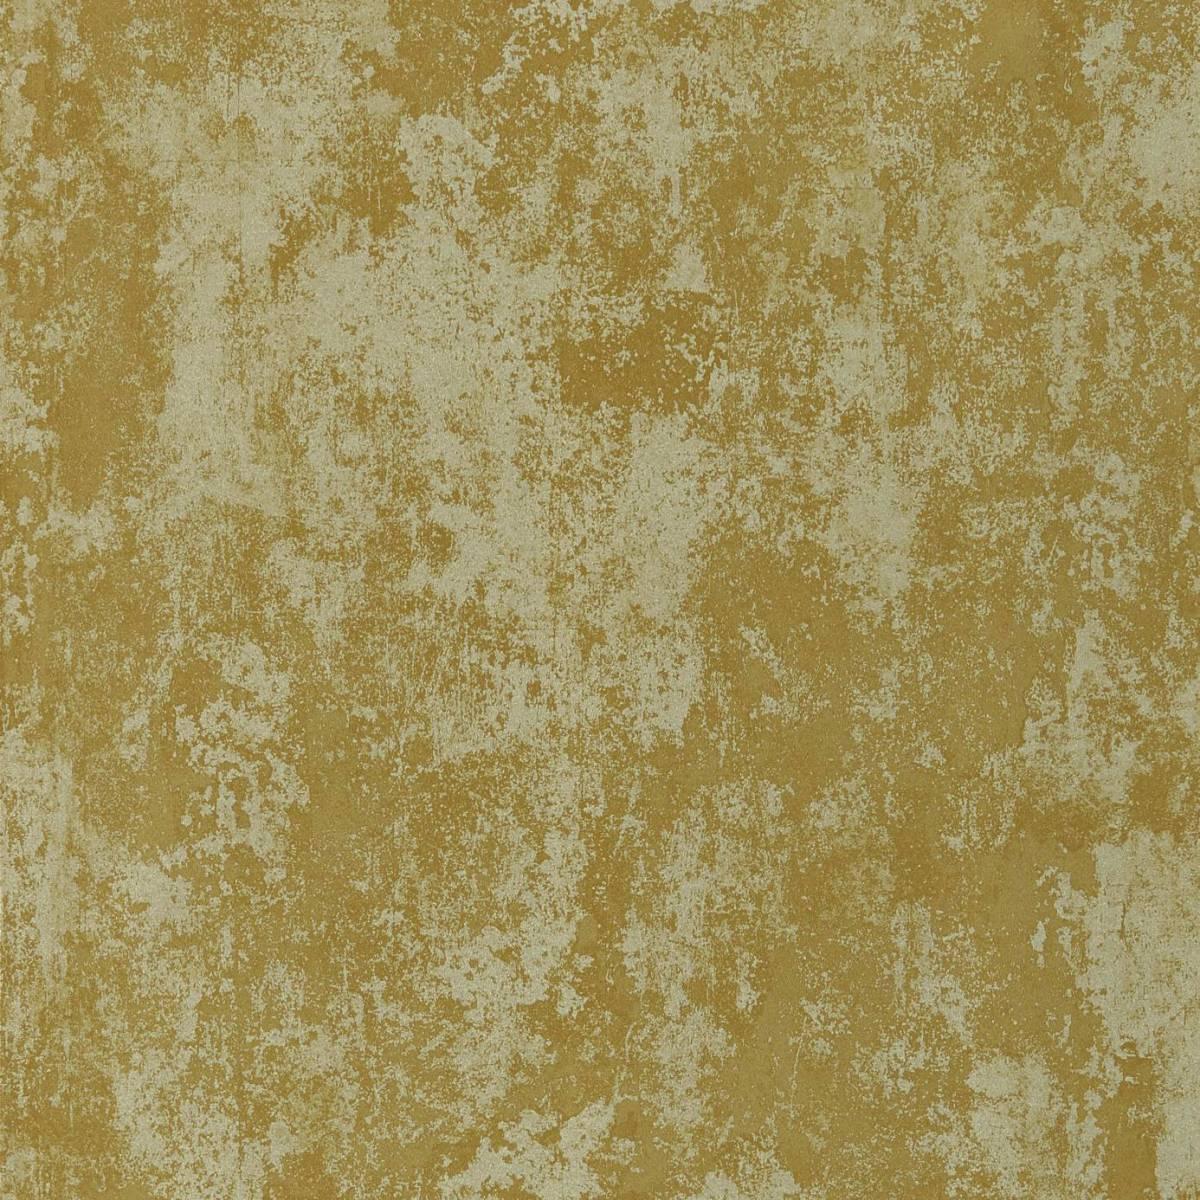 belvedere wallpaper - almond (111249) - harlequin palmetto